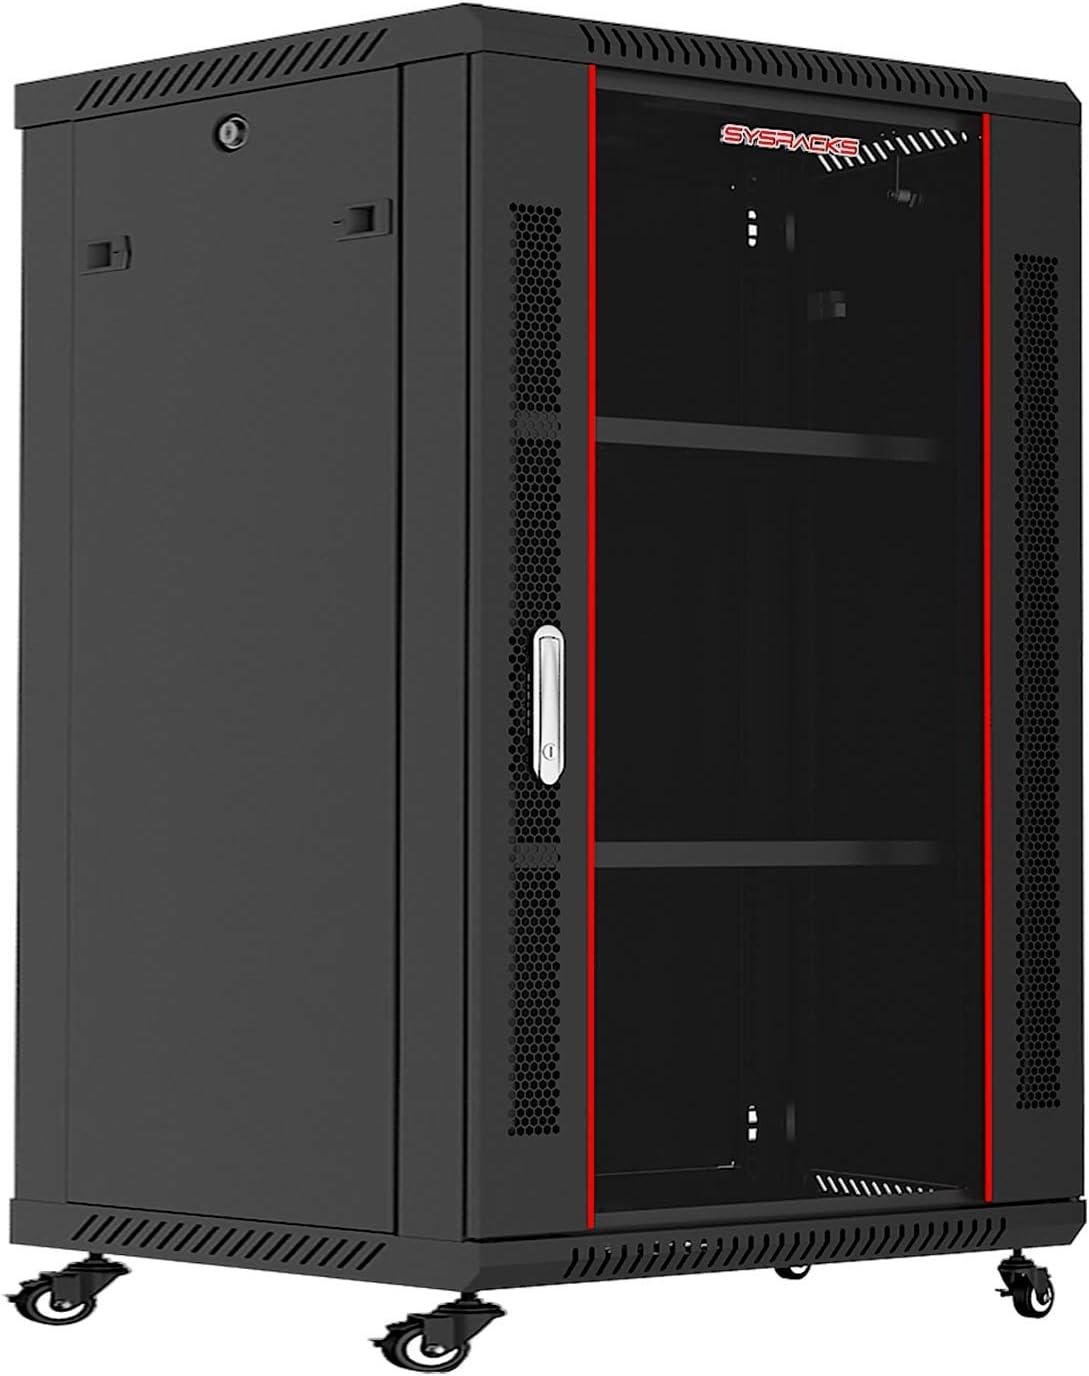 Sysracks - Server Rack - Wall Cabinet - 18 U Wall Mount Rack Enclosure with Fans - Audio Rack - Network Rack - 24 Inch Depth AV Cabinet - with Casters - PDU - Shelf - Locking Cabinet - Black